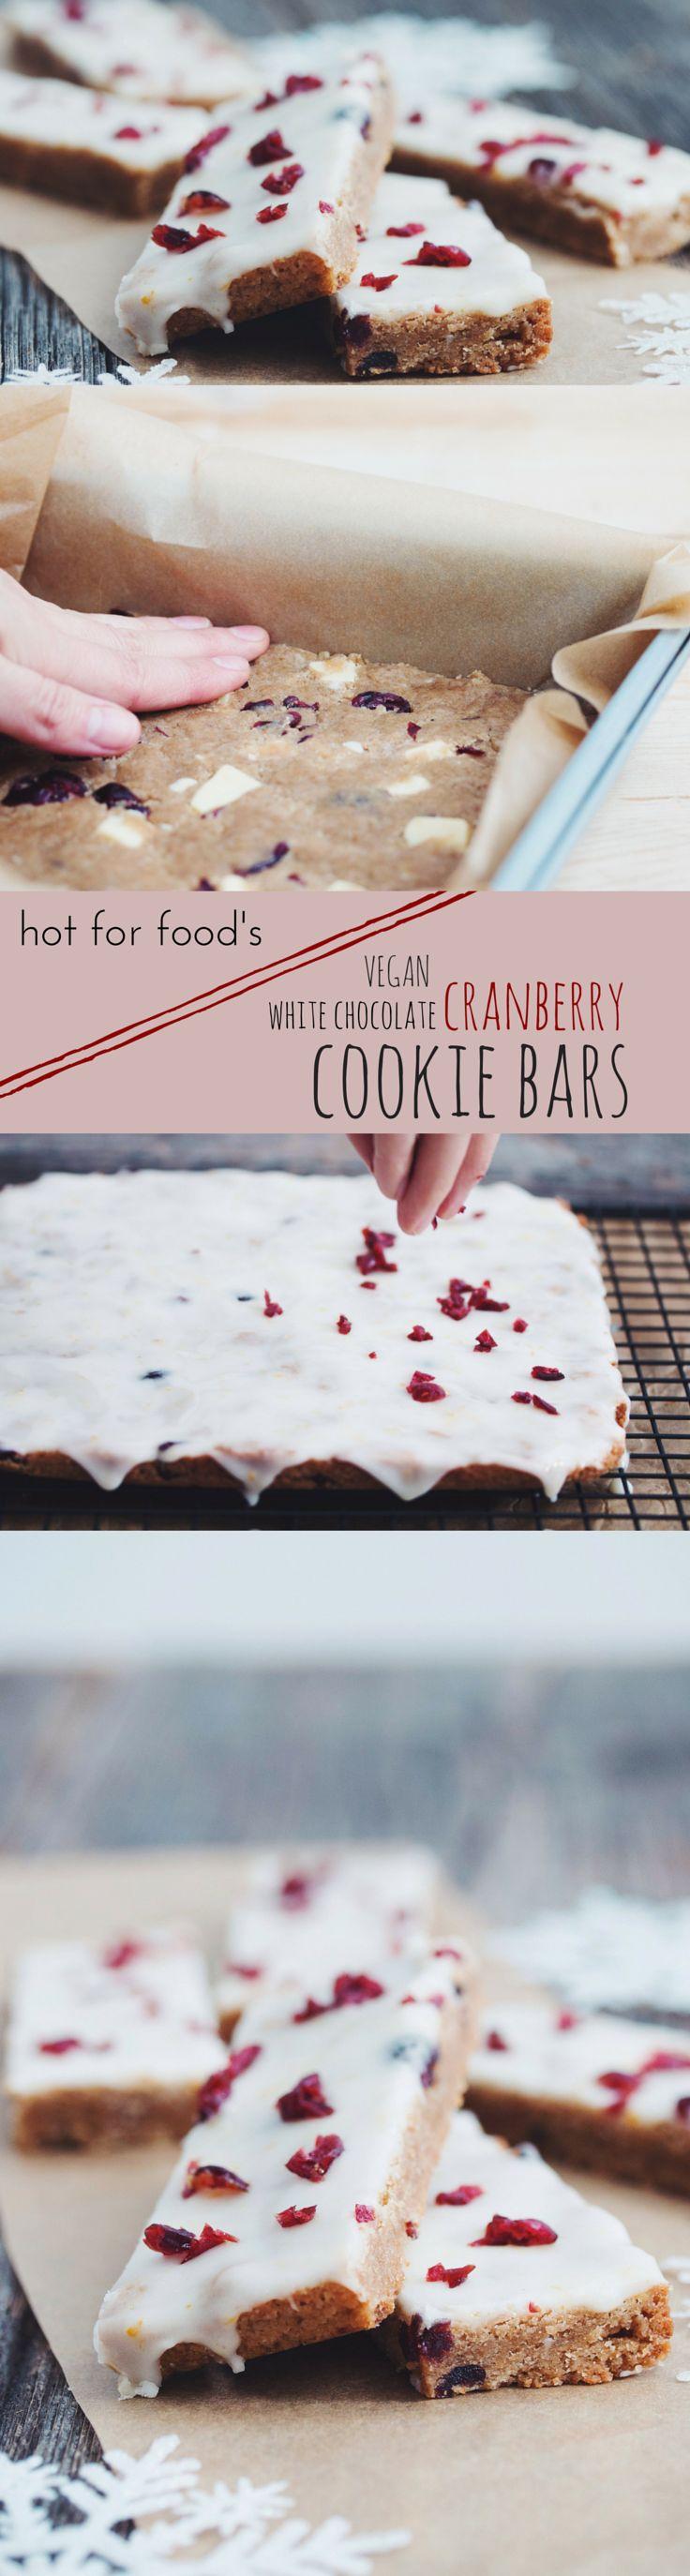 #vegan white chocolate cranberry cookie bars #christmascookies | RECIPE on hotforfoodblog.com